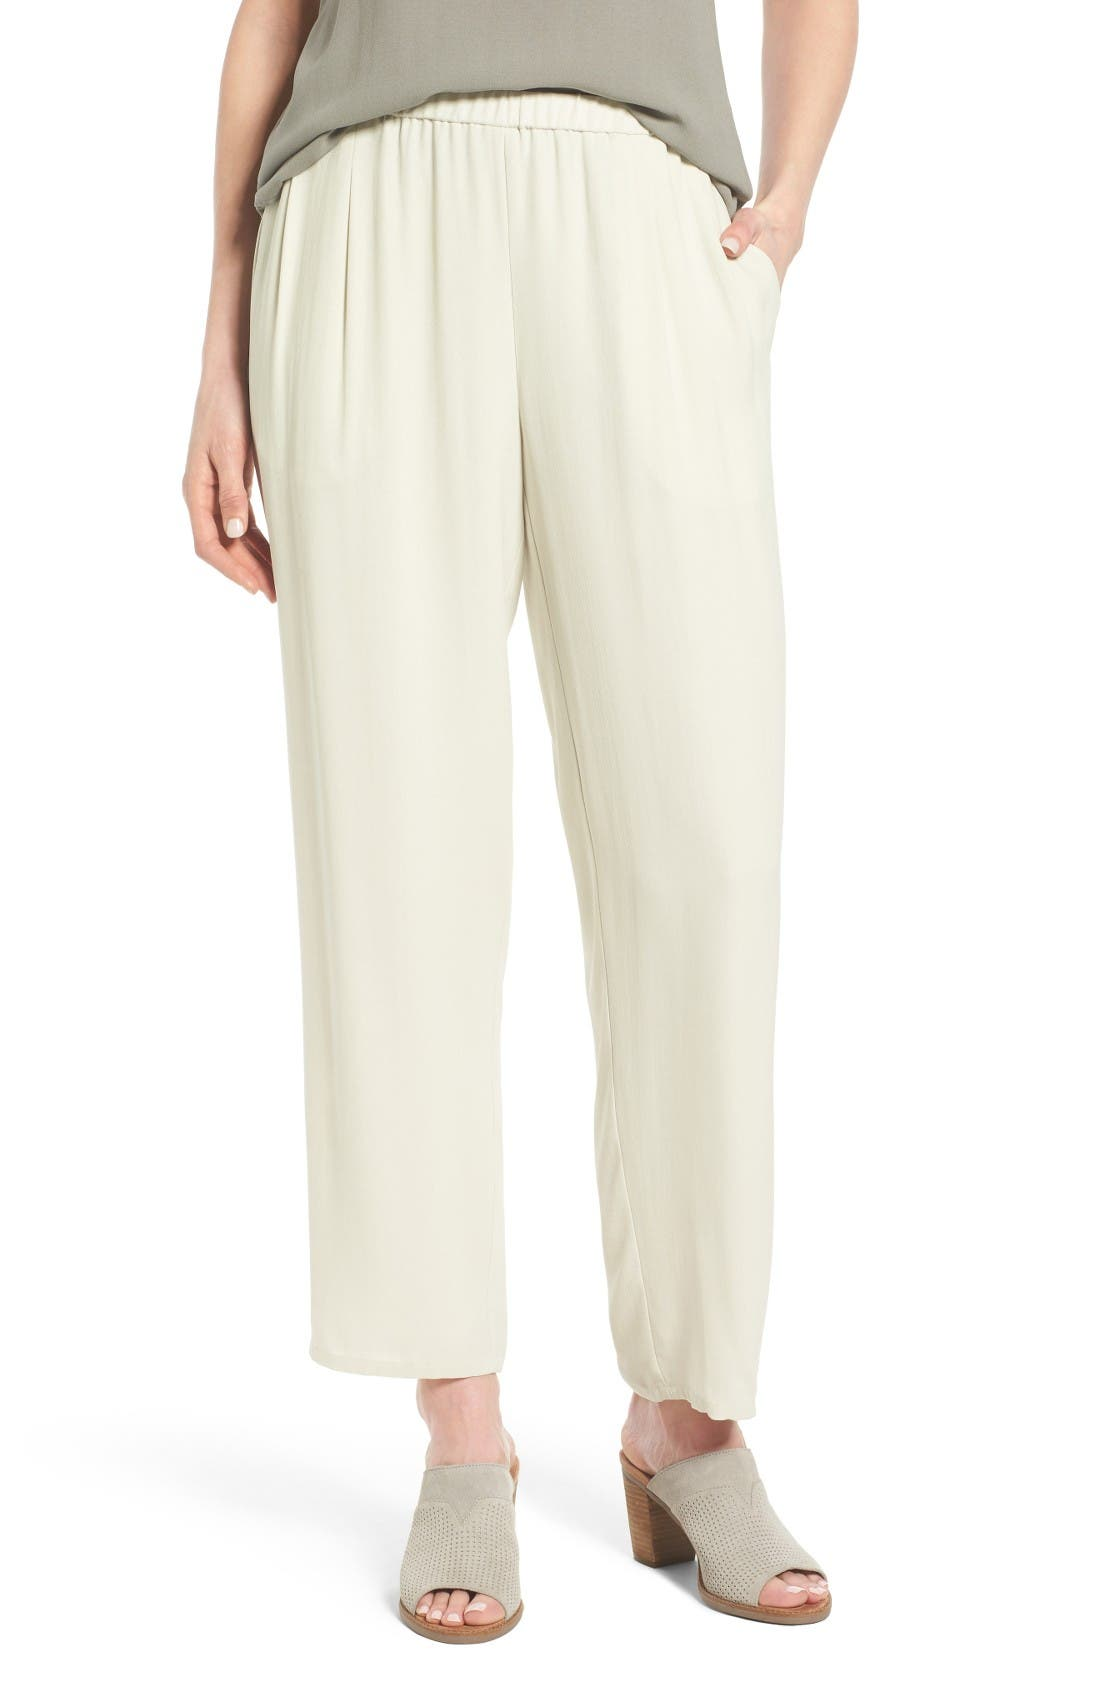 Alternate Image 1 Selected - Eileen Fisher Silk Georgette Crepe Straight Ankle Pants (Regular & Petite)